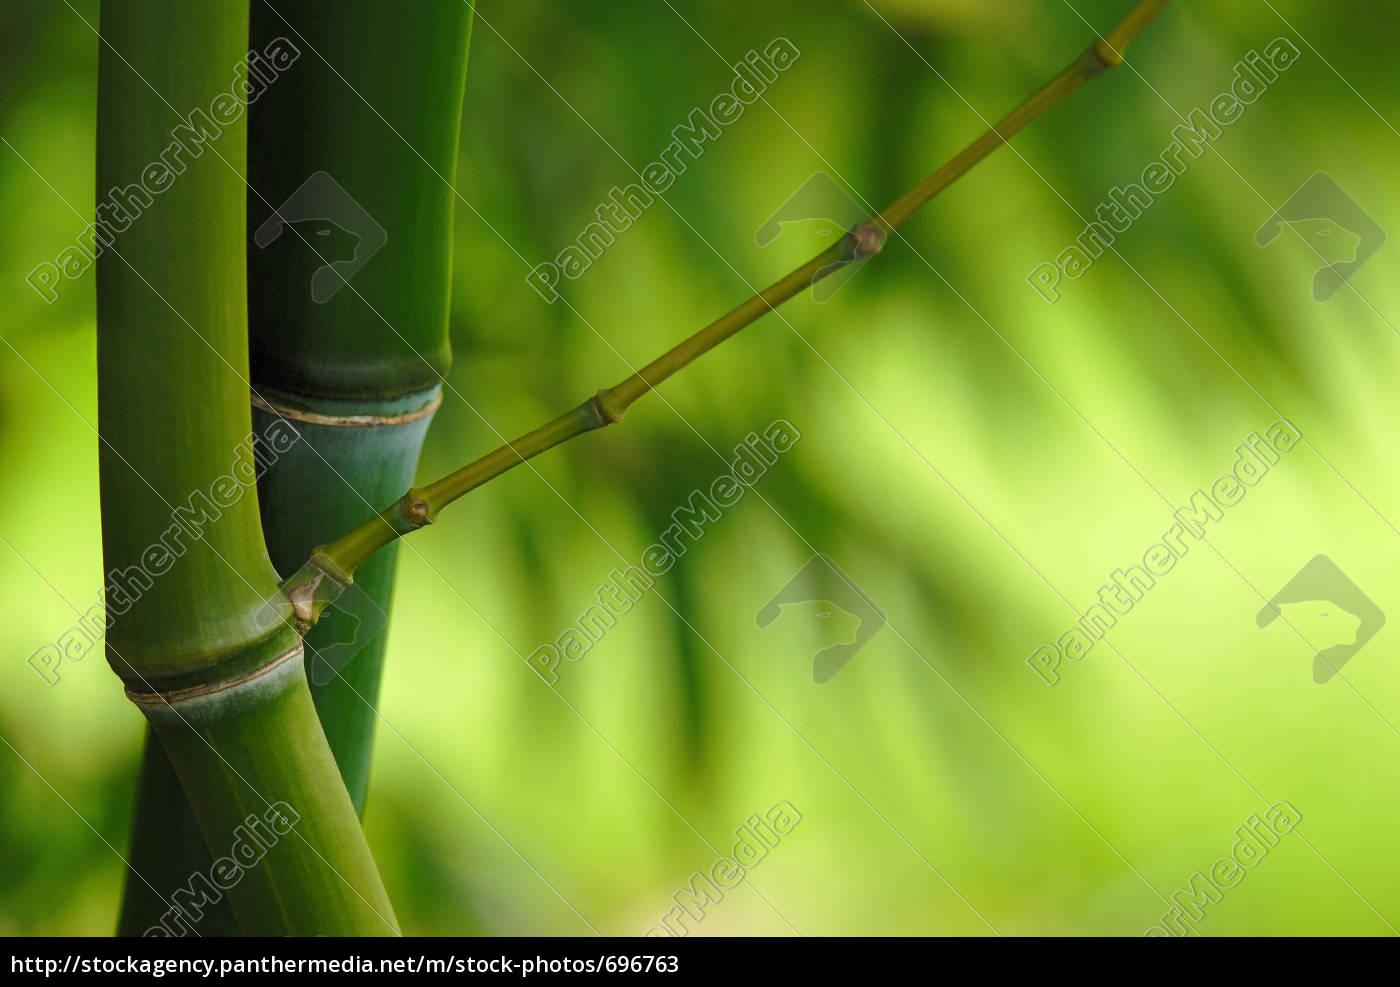 bamboo, phyllostachys, iridescens - 696763